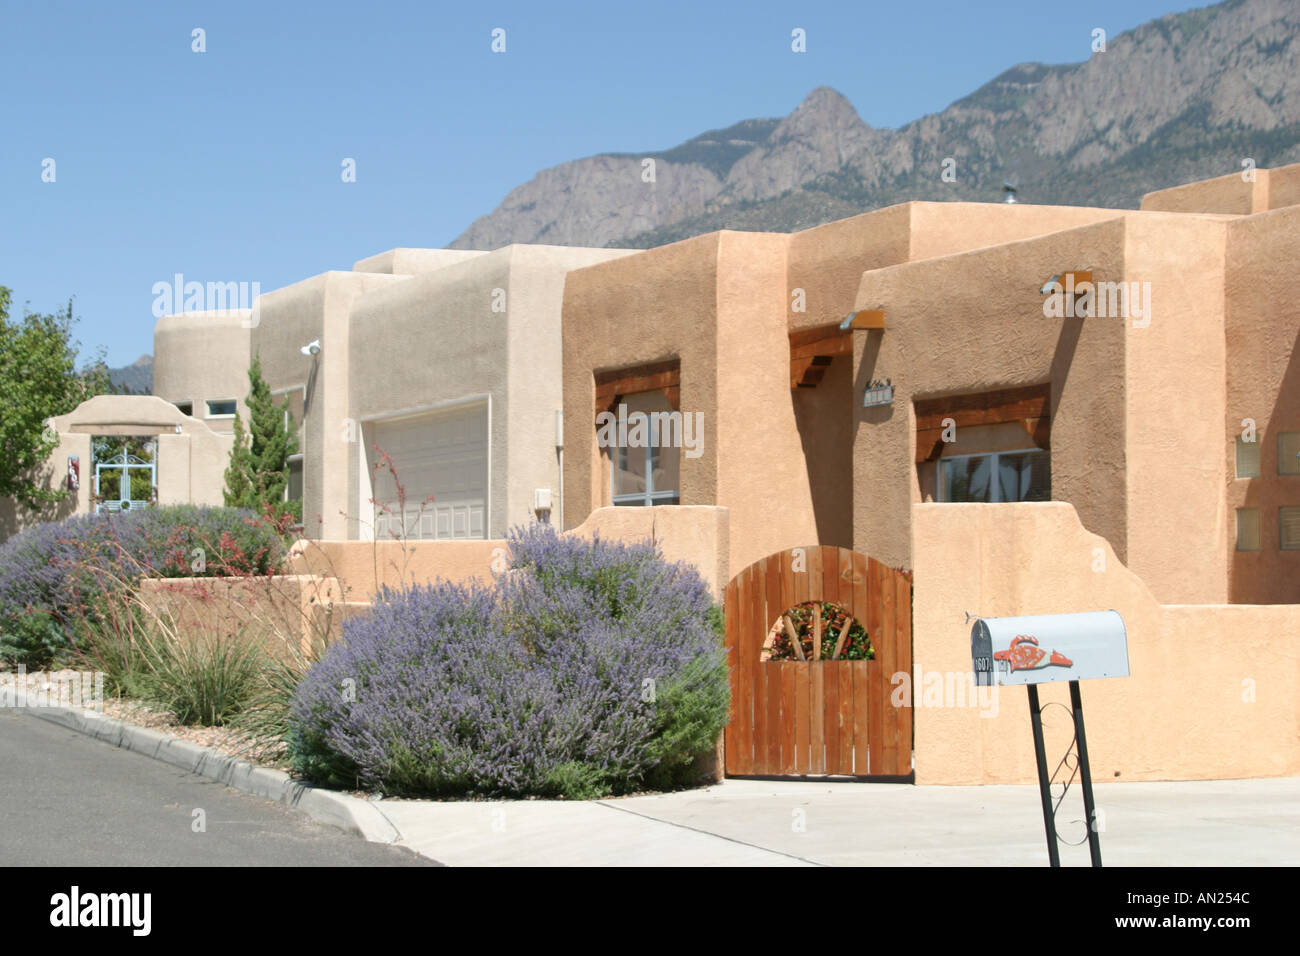 Albuquerque To Santa Fe >> Albuquerque New Mexico Sandia Heights adobe style homes high desert T Stock Photo: 1385803 - Alamy